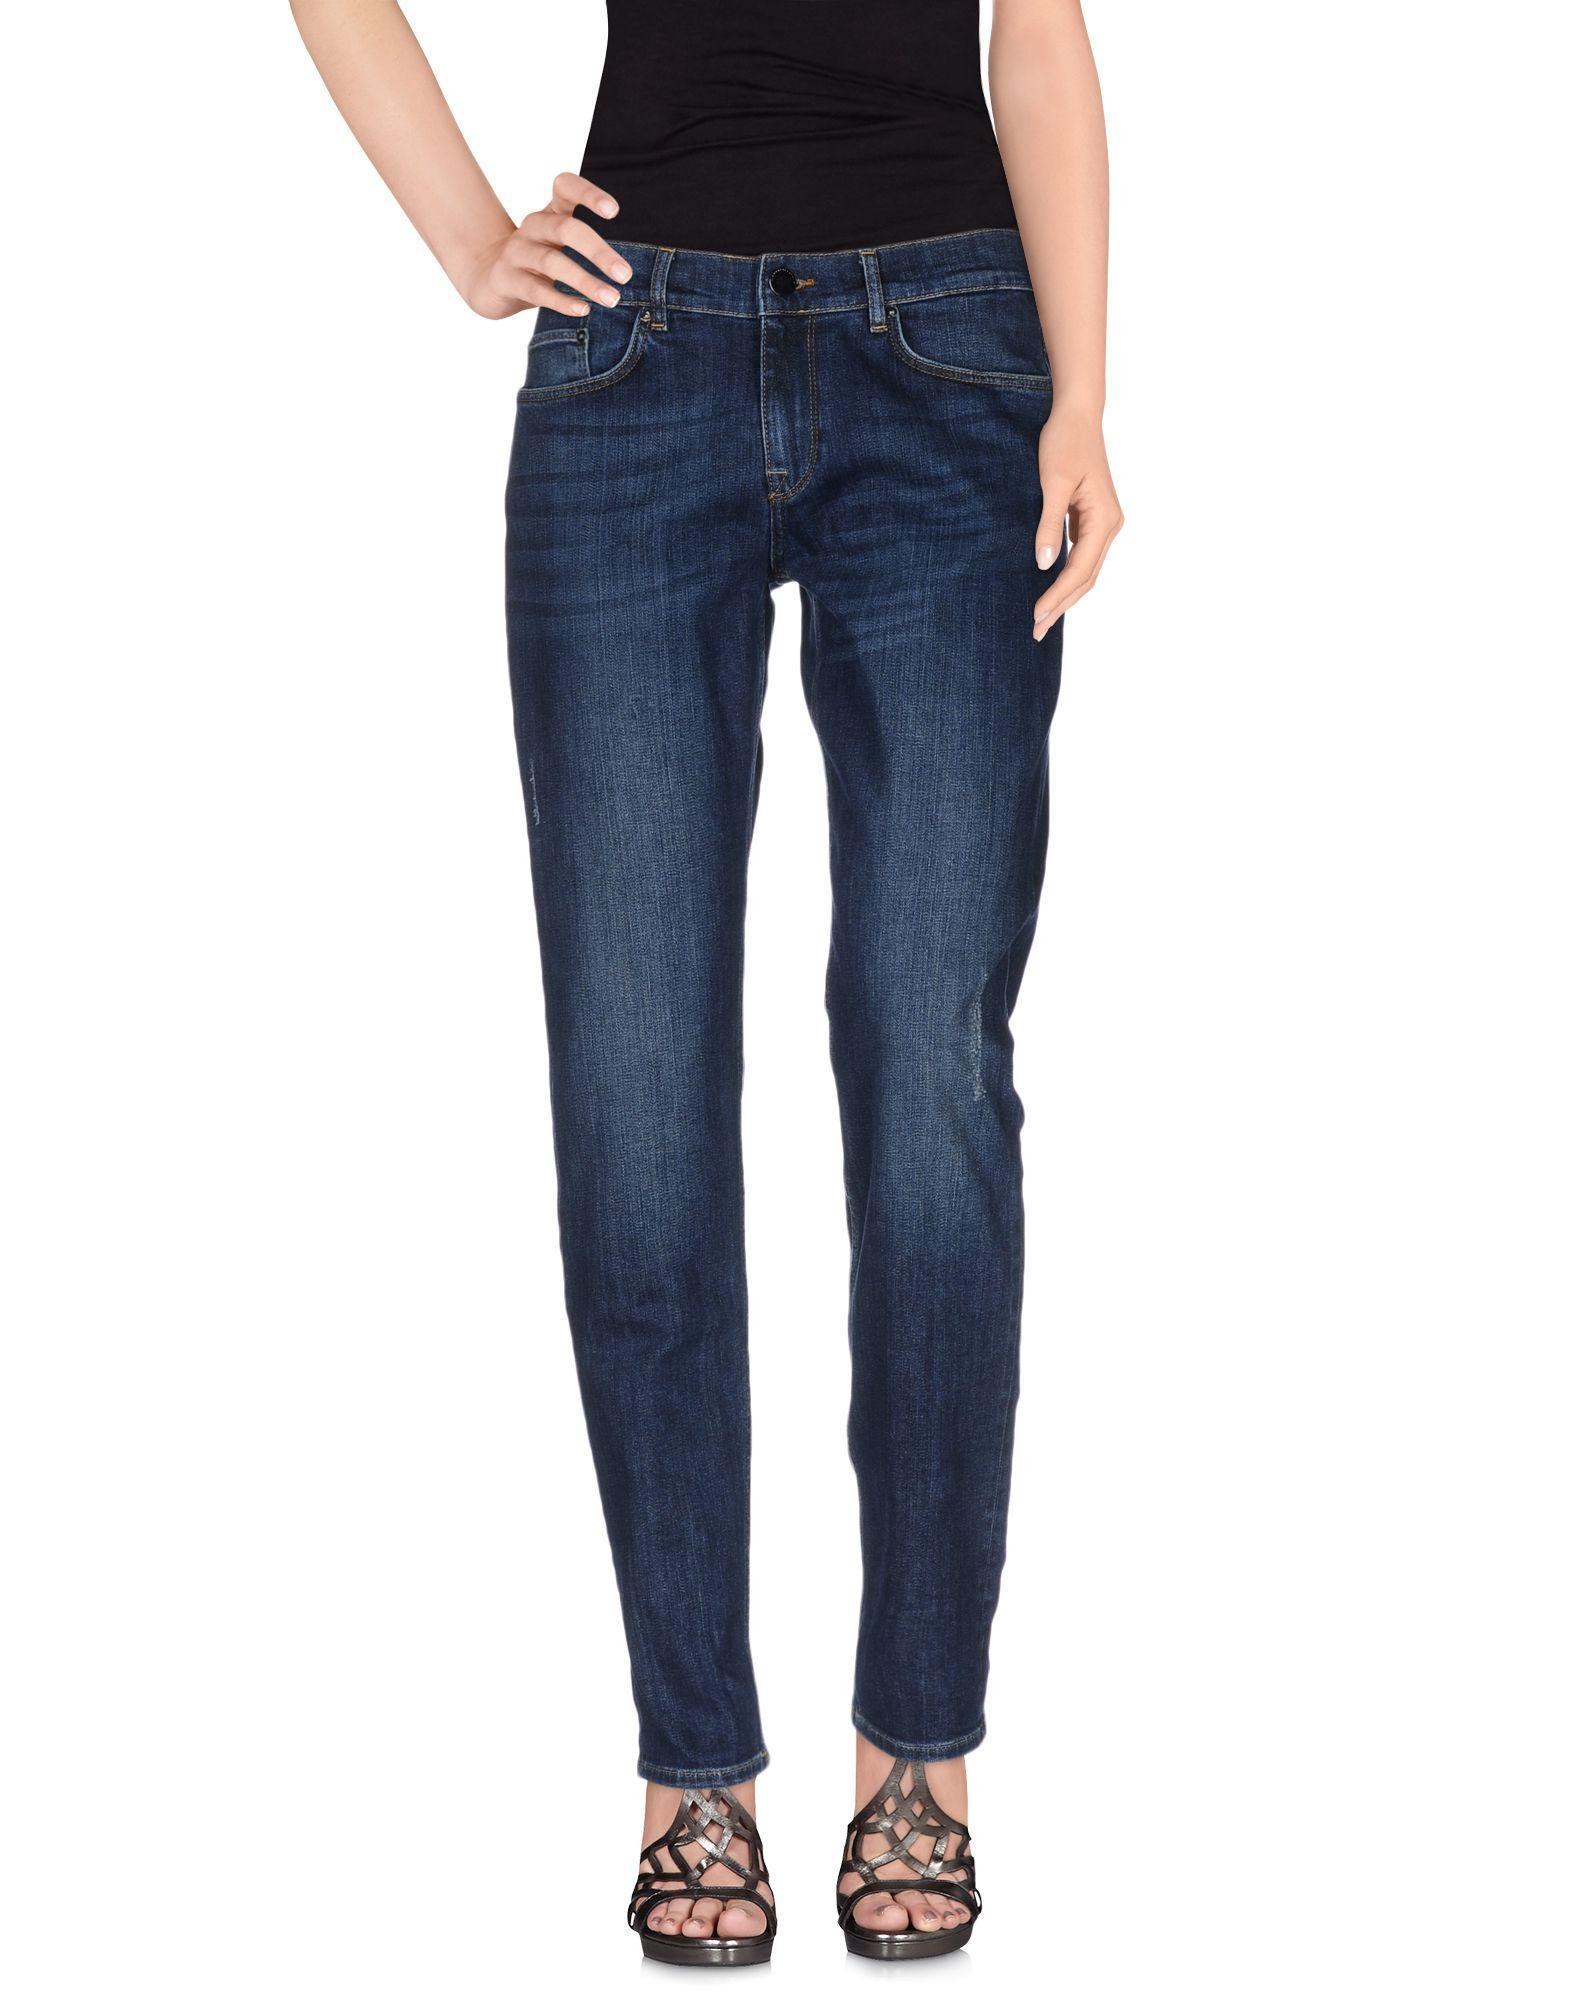 Victoria Beckham Denim Pants In Blue